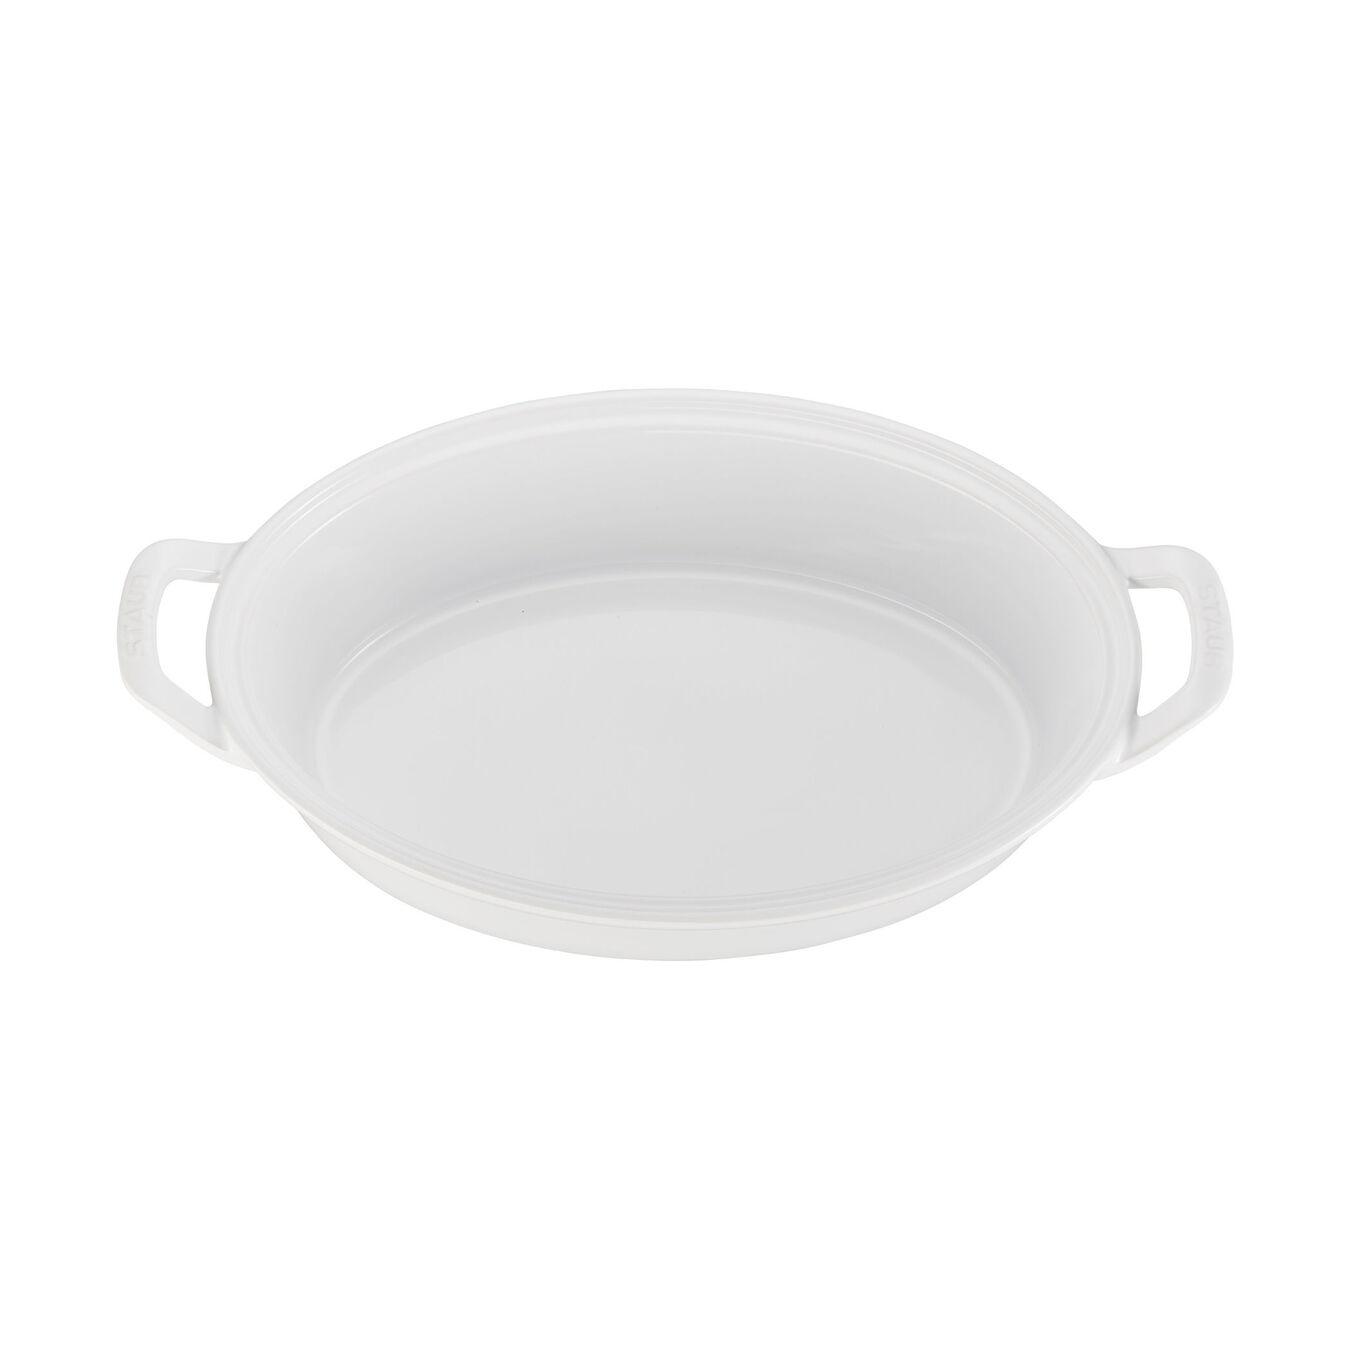 Ceramic Special shape bakeware, white,,large 2